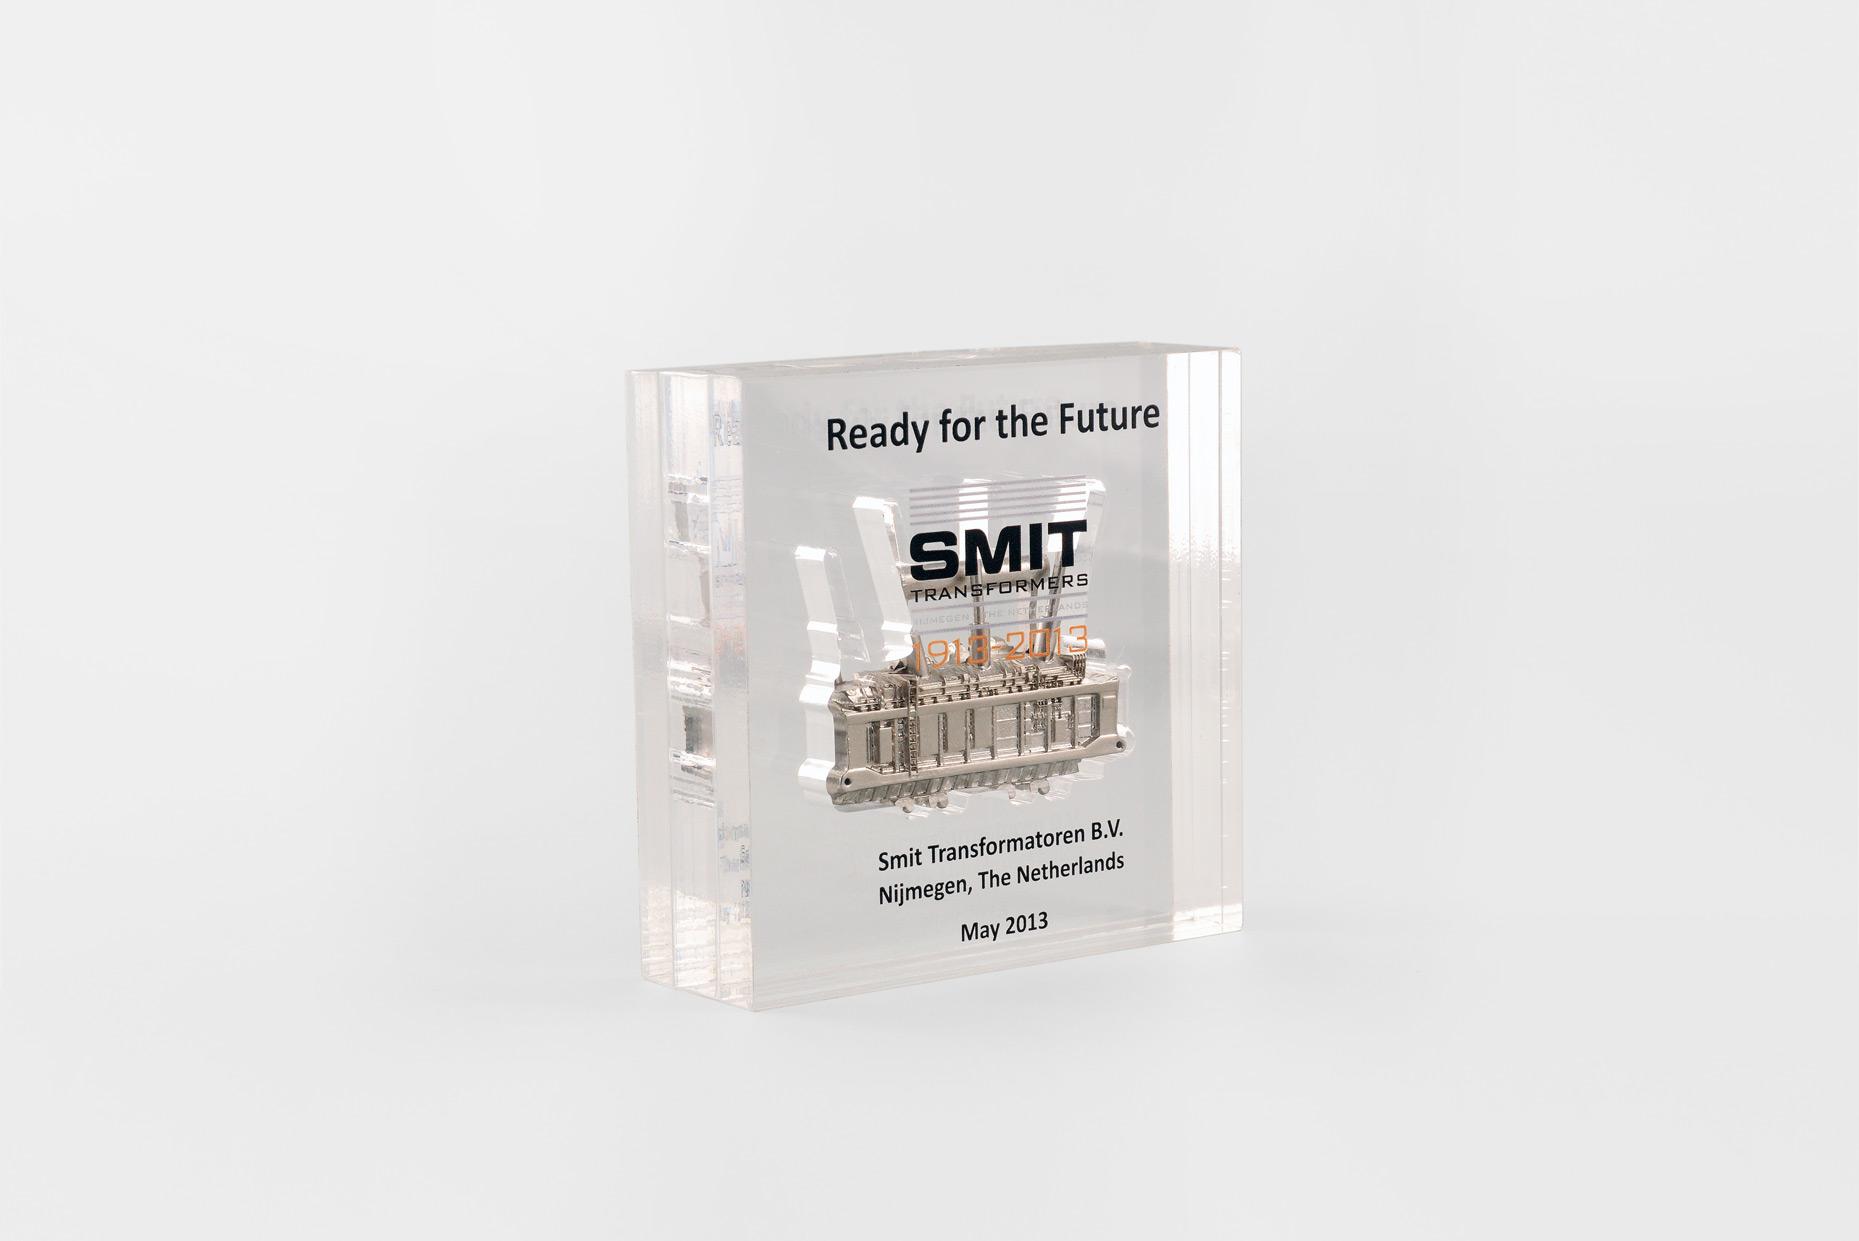 nagrada_SMIT-transformatori.jpg